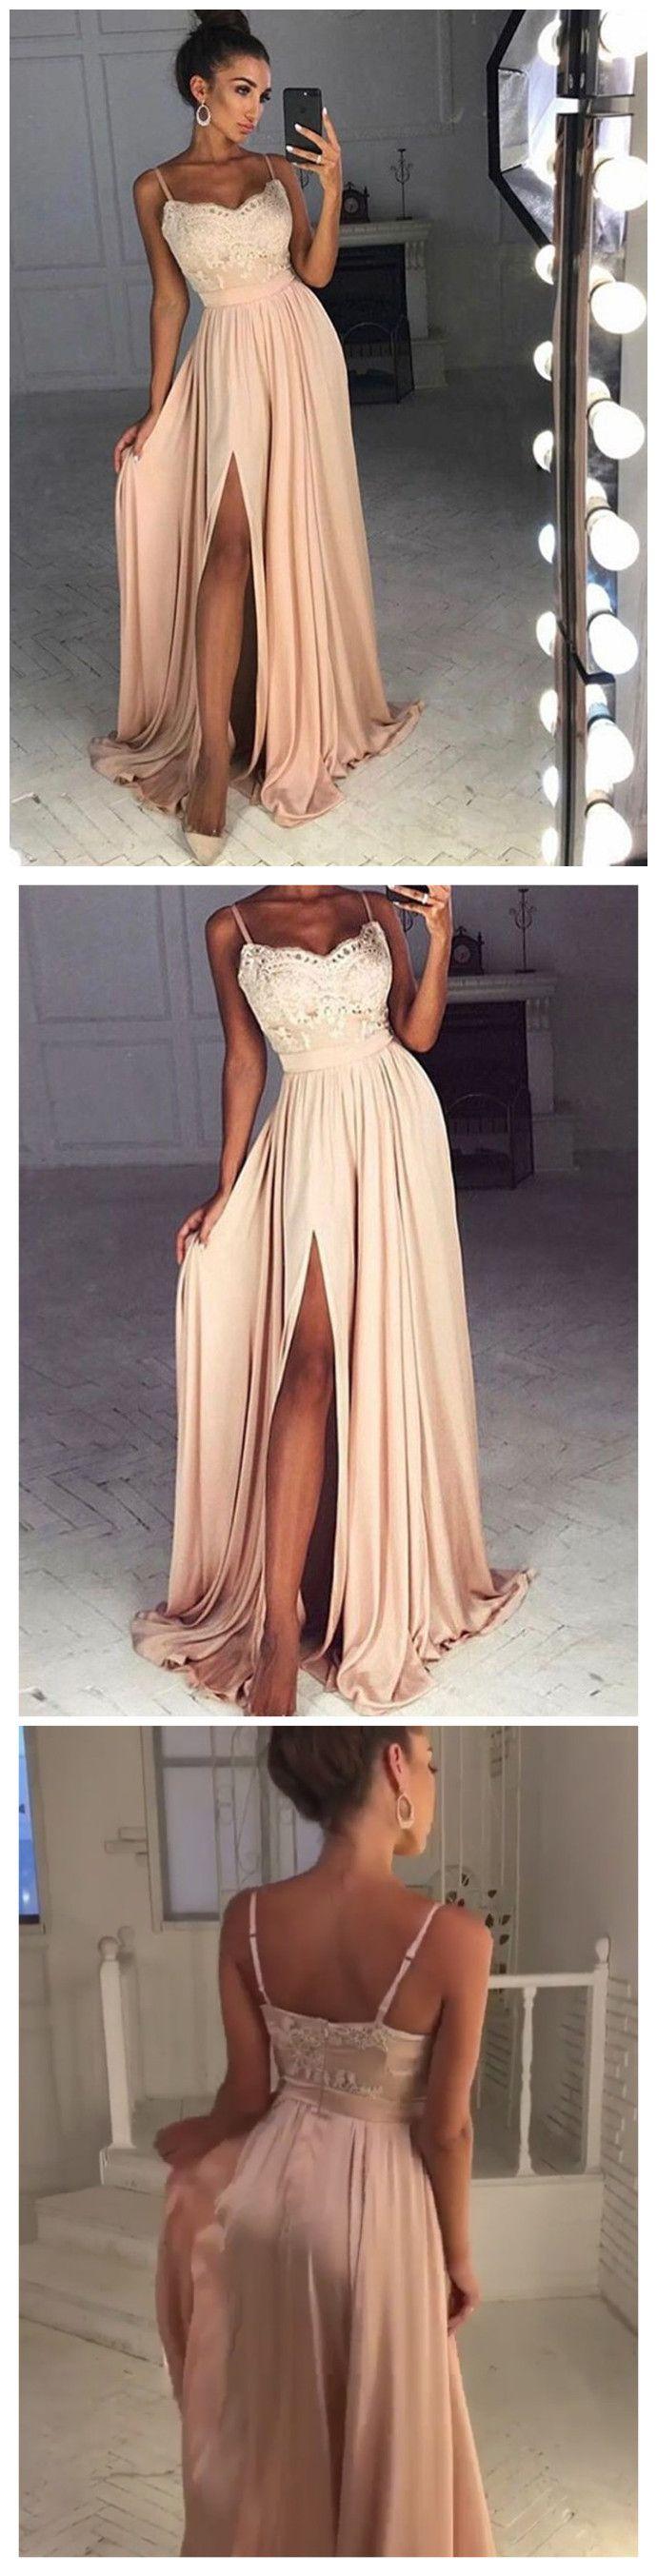 Aline prom dress pink spaghetti straps lace long prom dresses